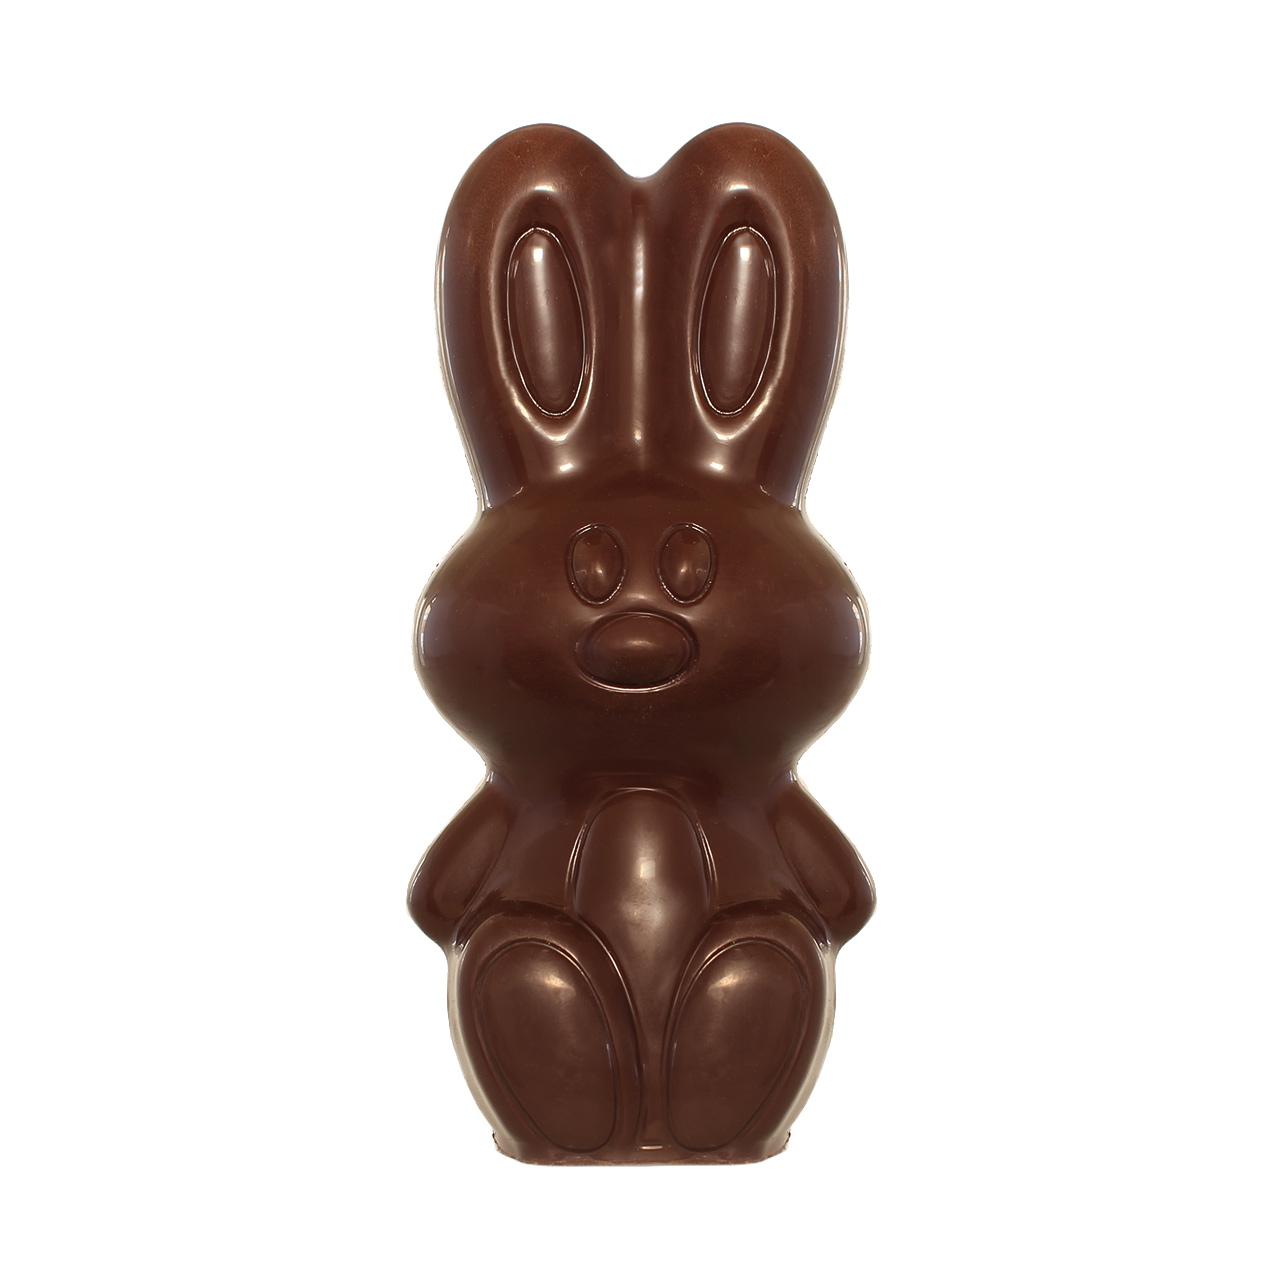 Kings Schokoladen-Osterhase, dunkle Schokolade